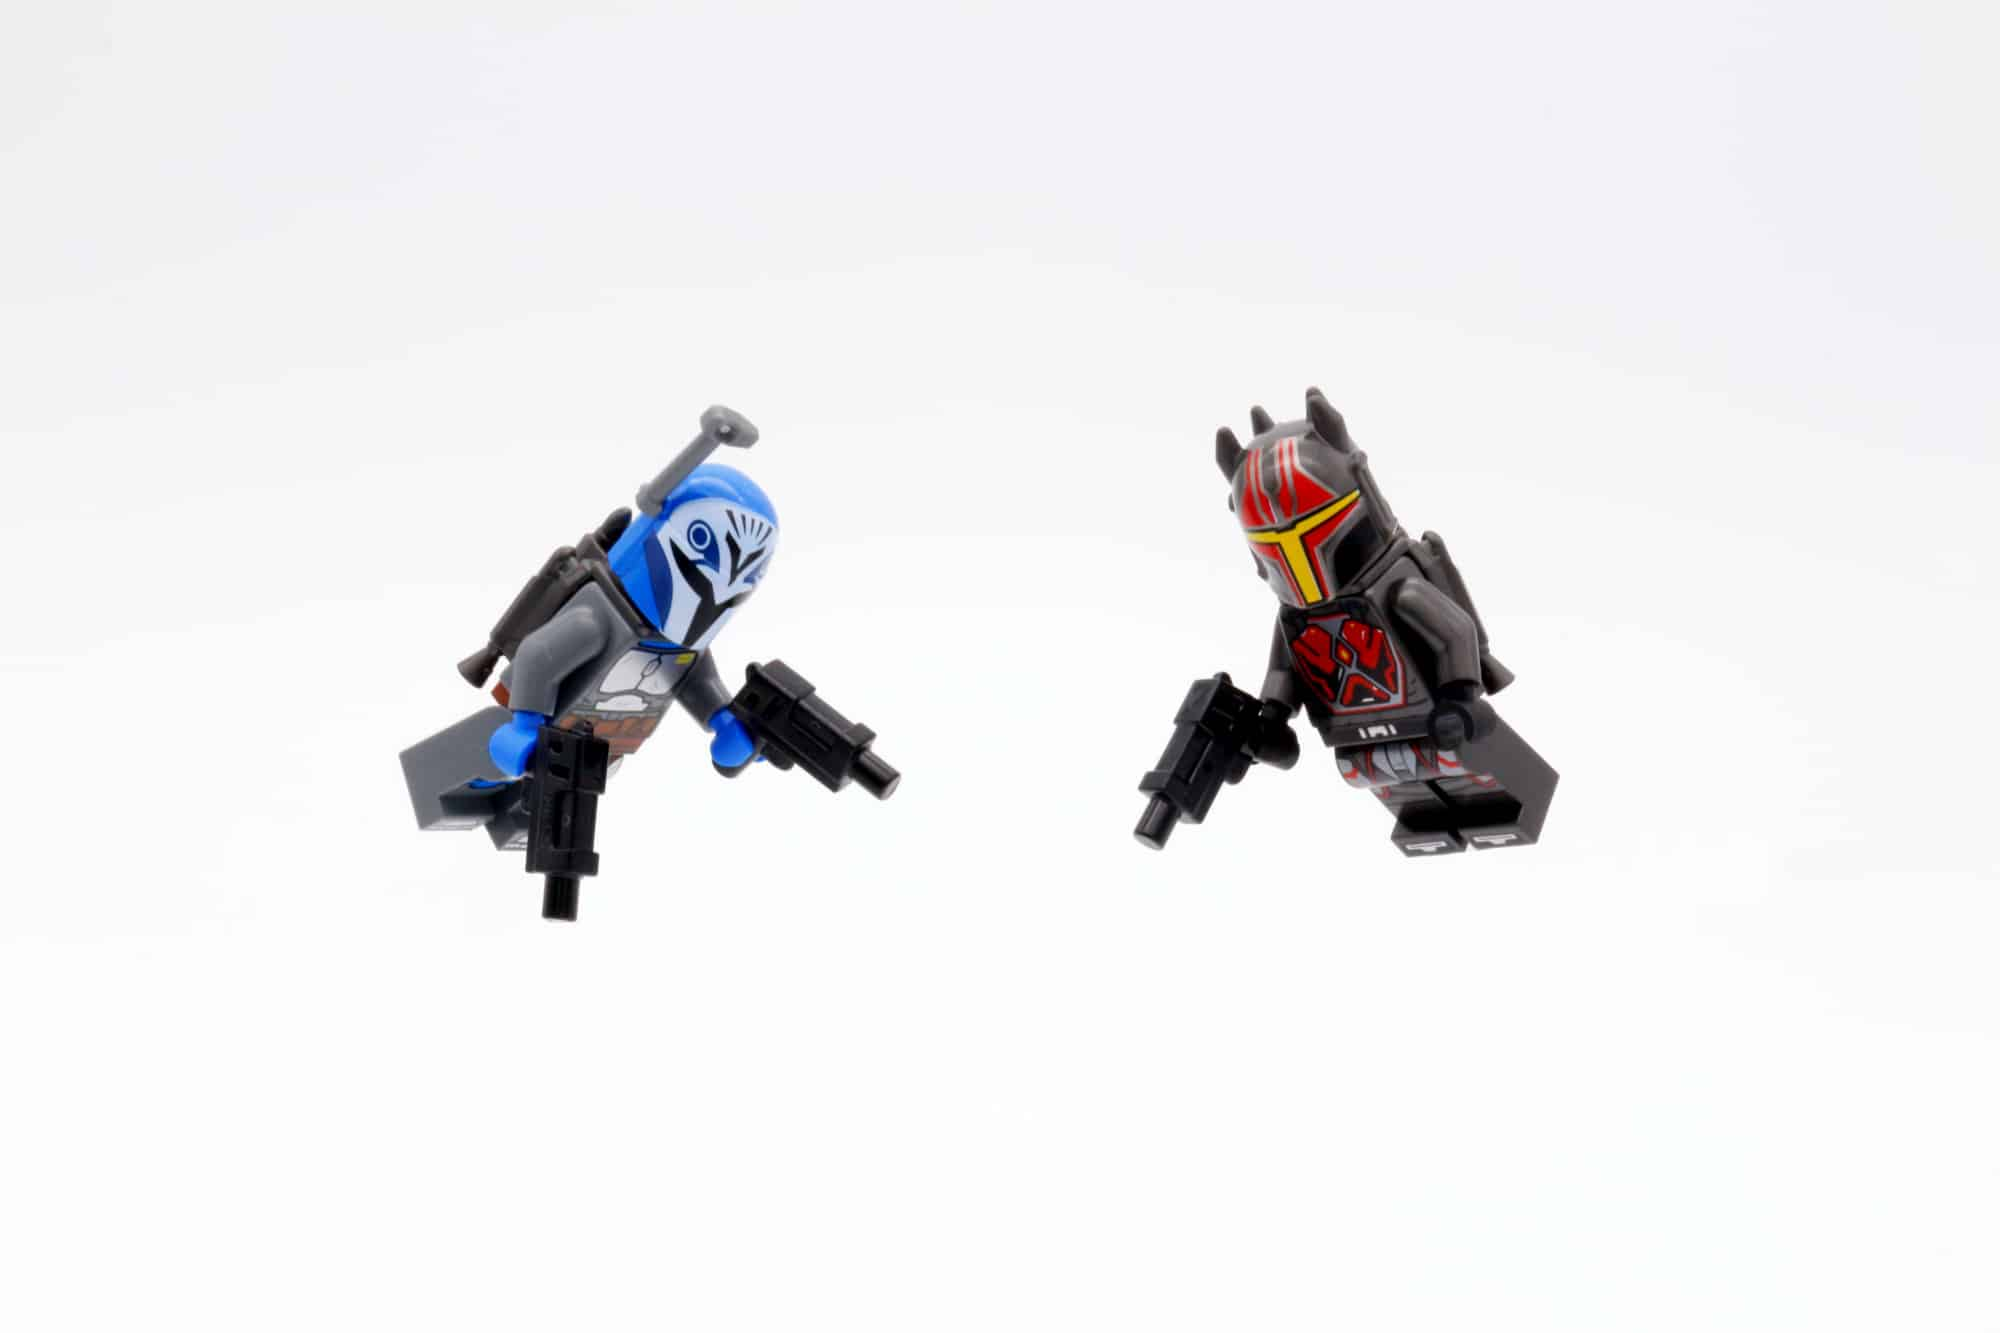 LEGO Star Wars 75316 Mandalorian Starfighter 32